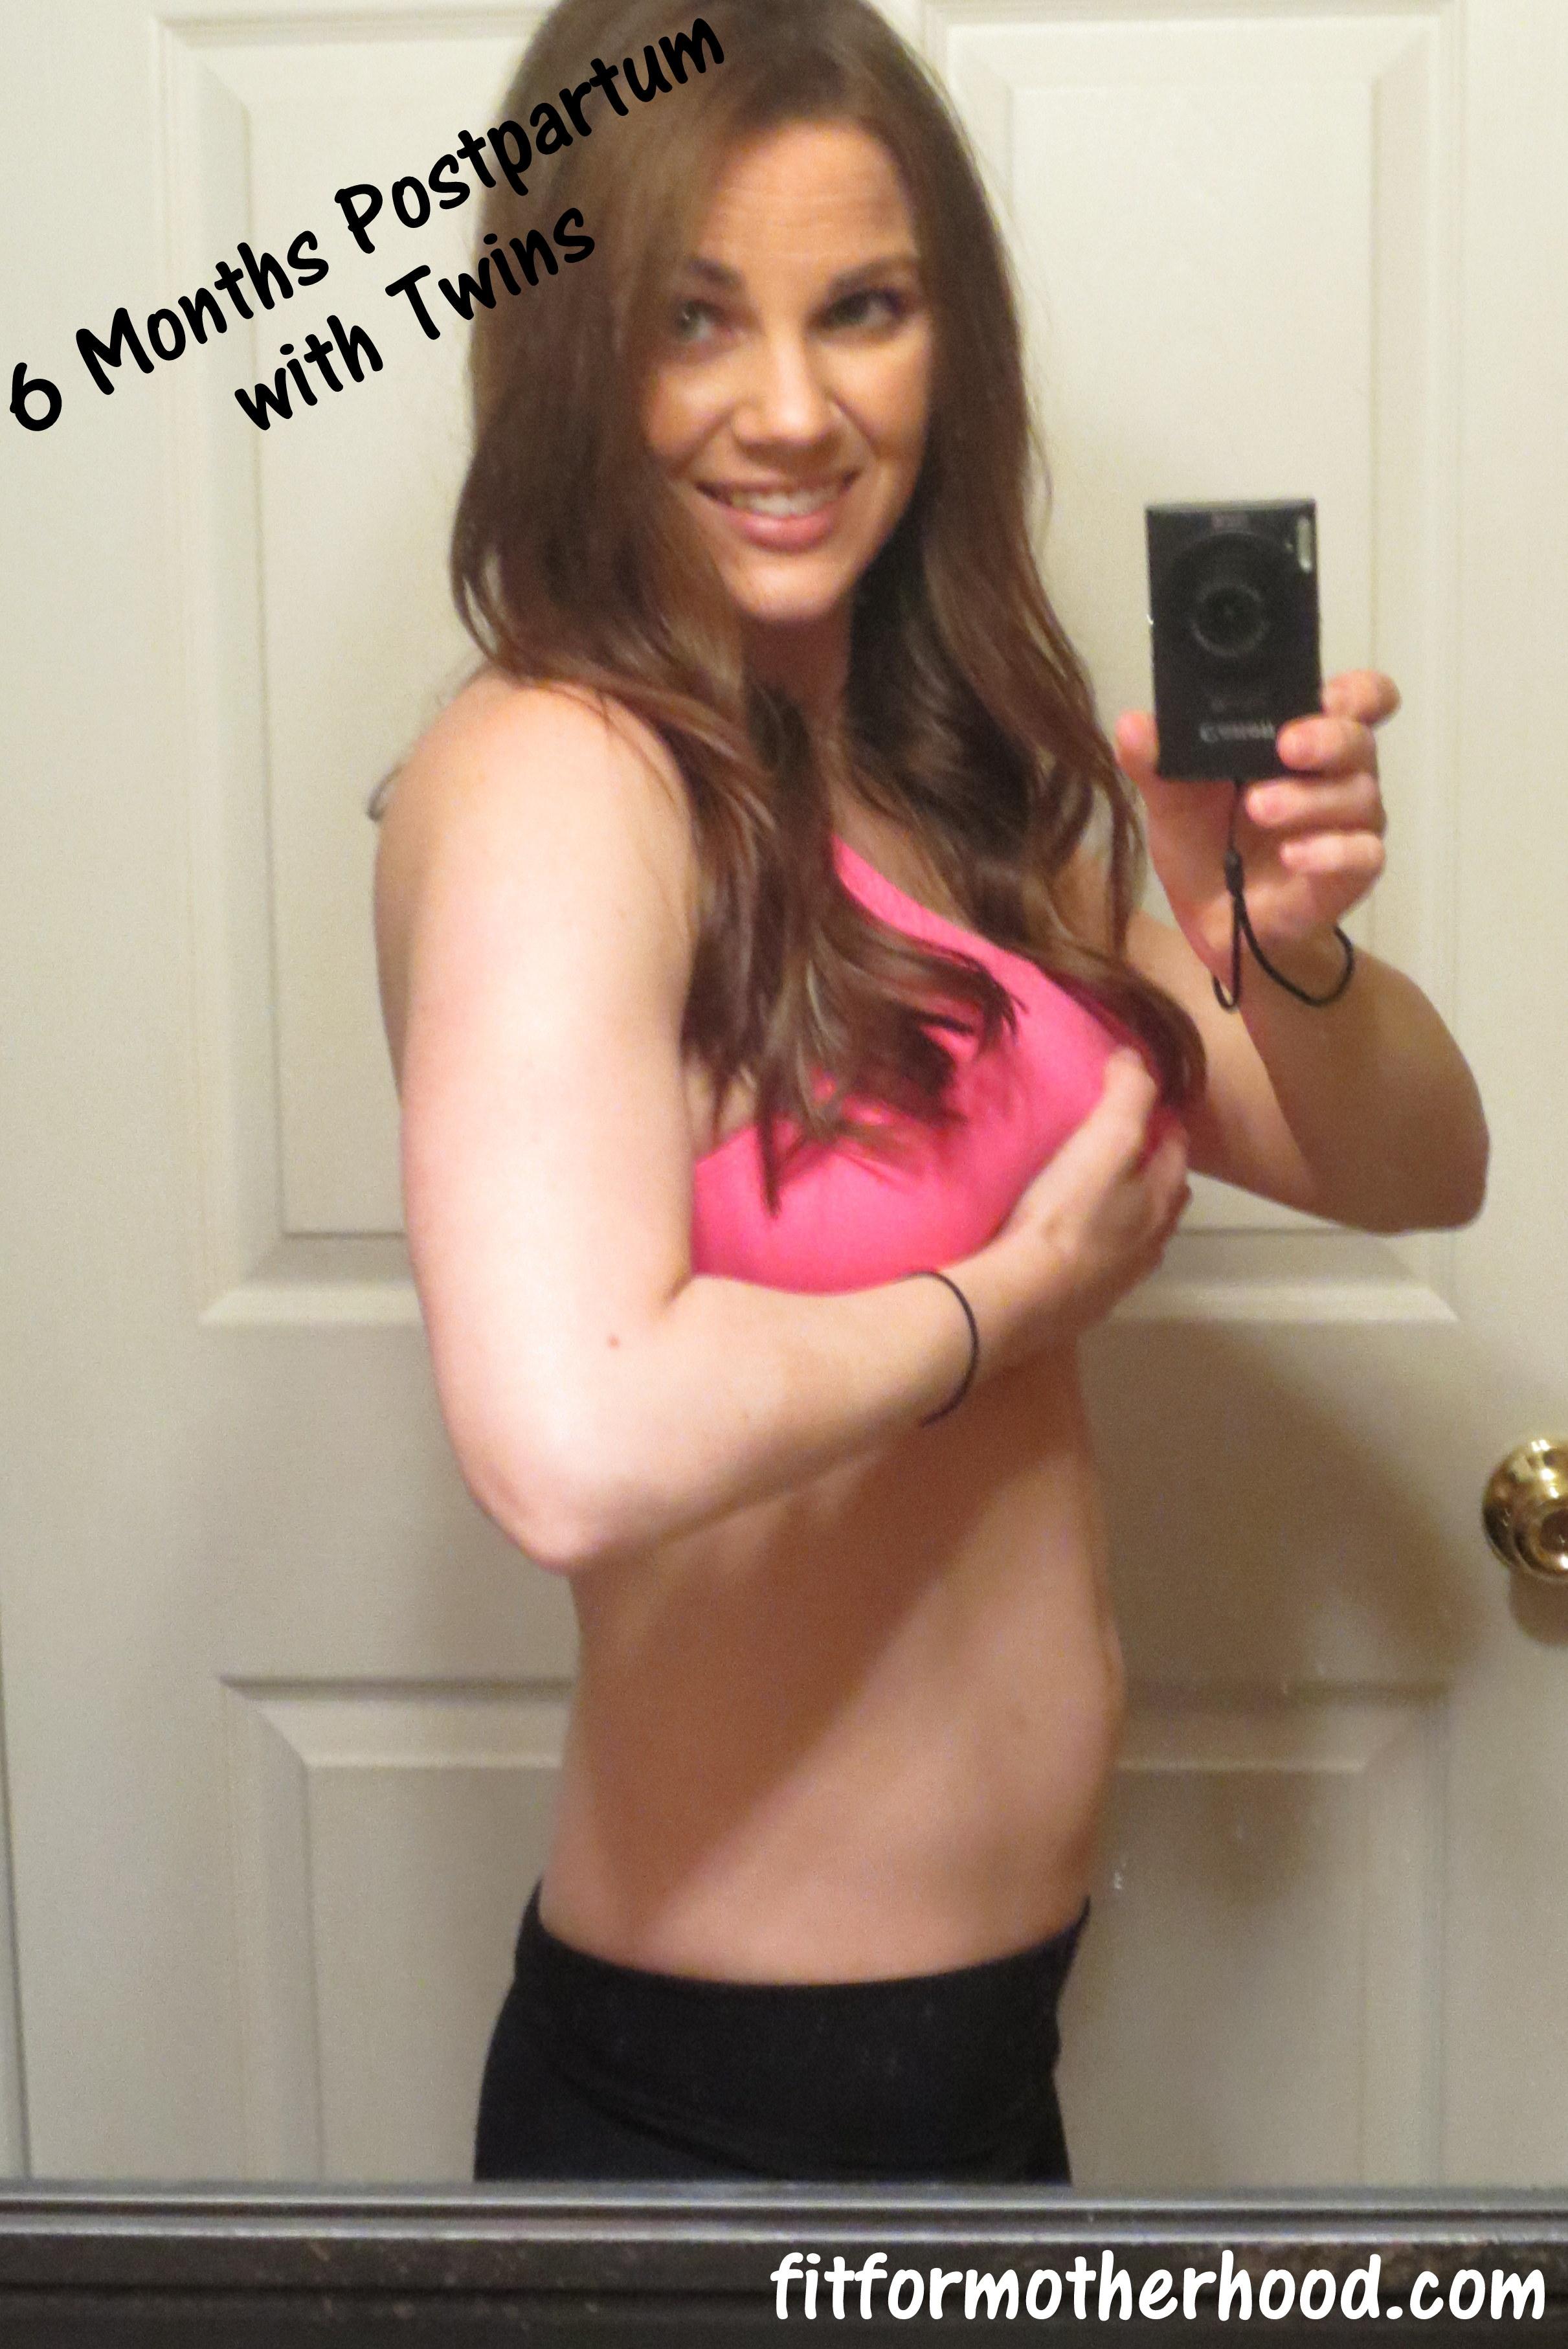 6 Months Postpartum – Mind and Body